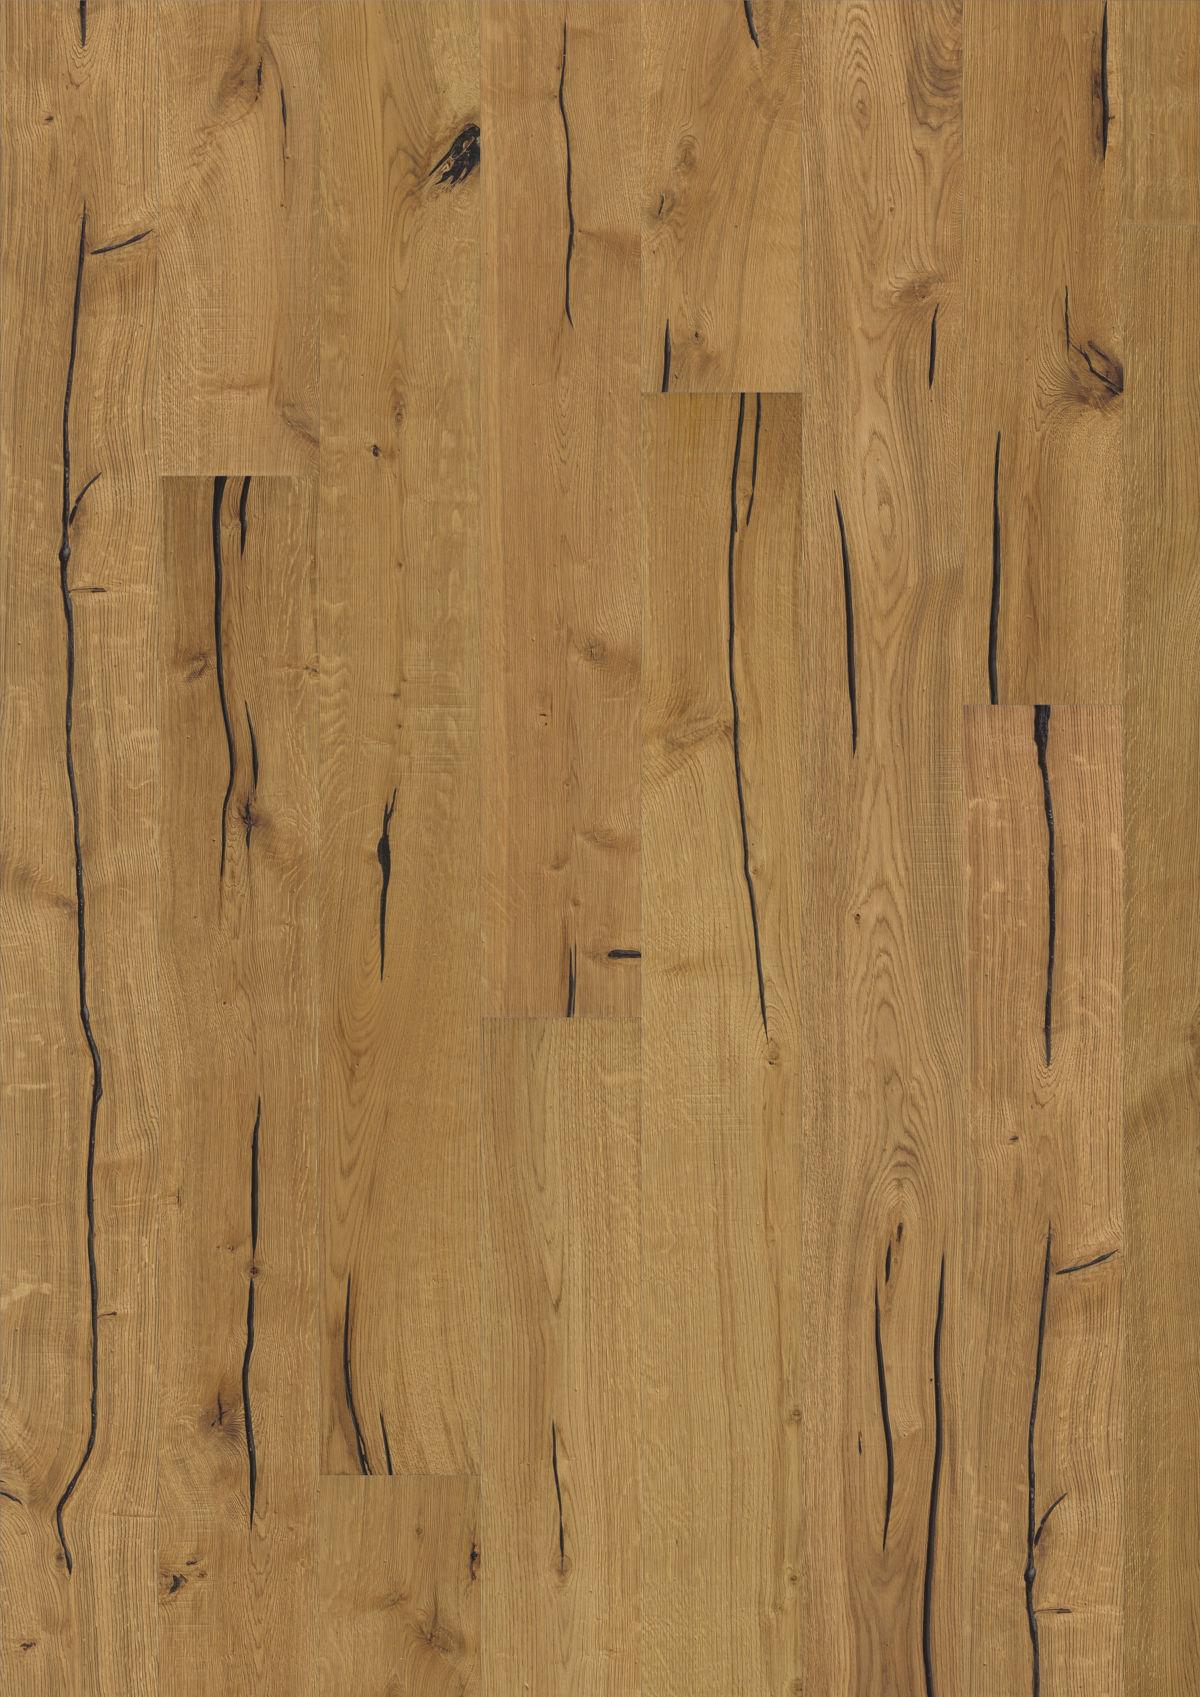 Kahrs oak finnveden engineered wood flooring for Kahrs hardwood flooring